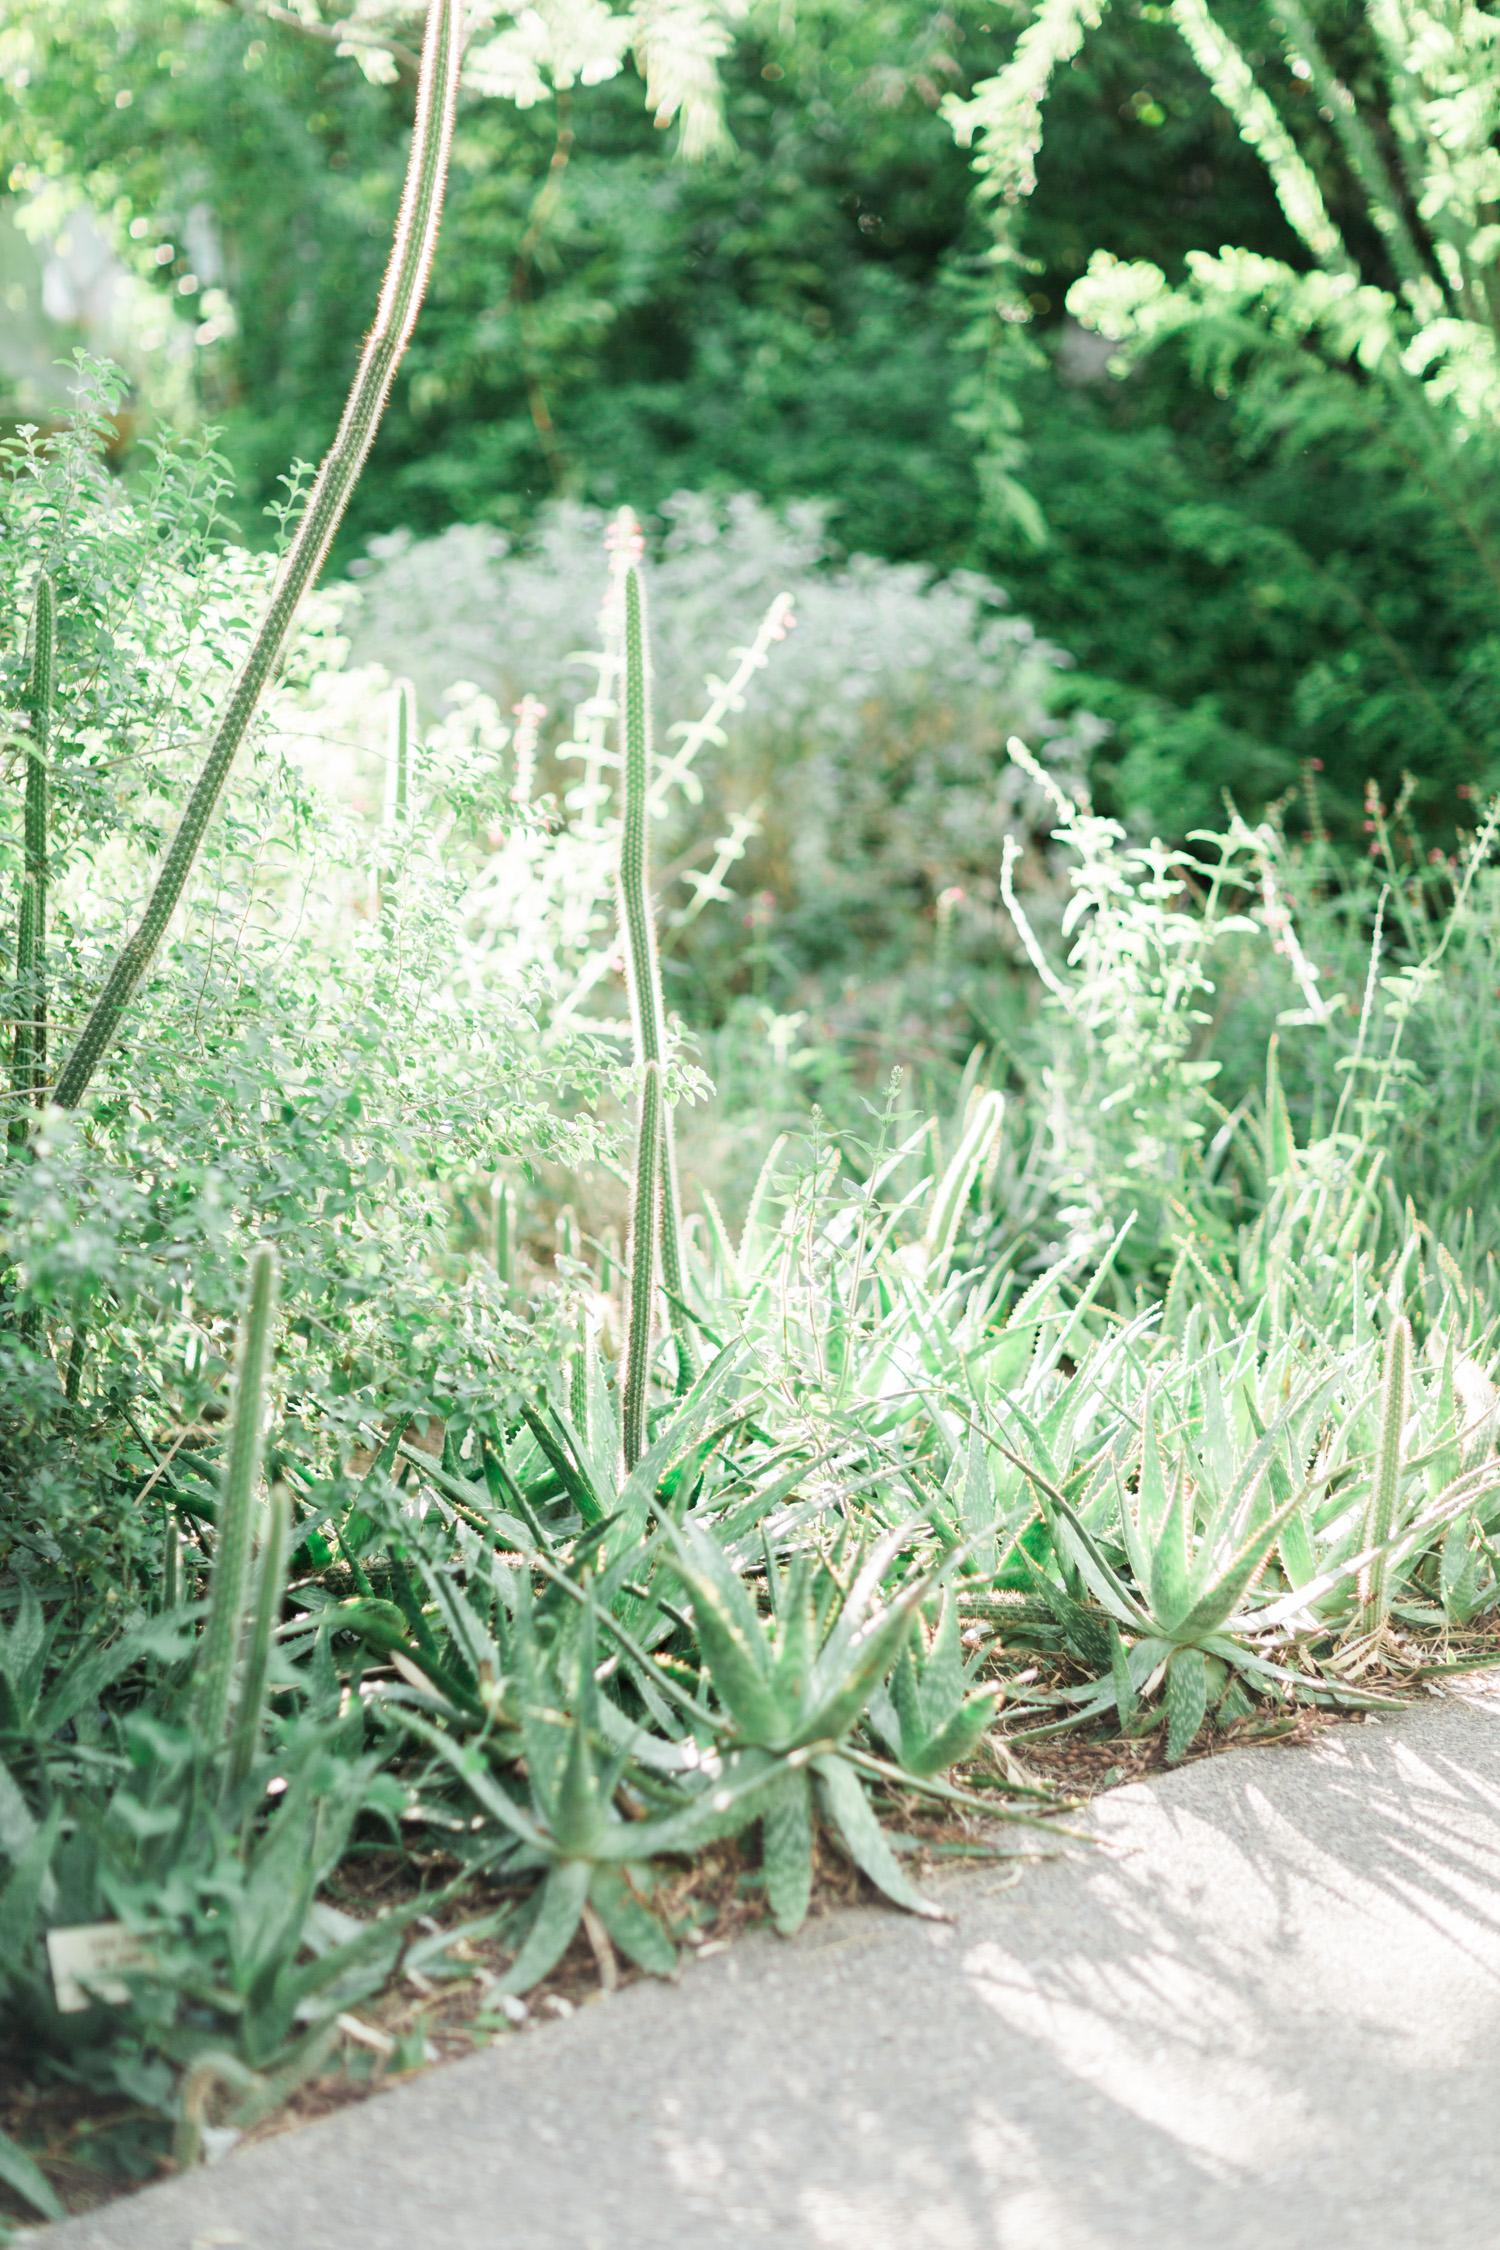 Desert cactus, foliage and aloe vera plants along a pathway at Tohono Chul Gardens